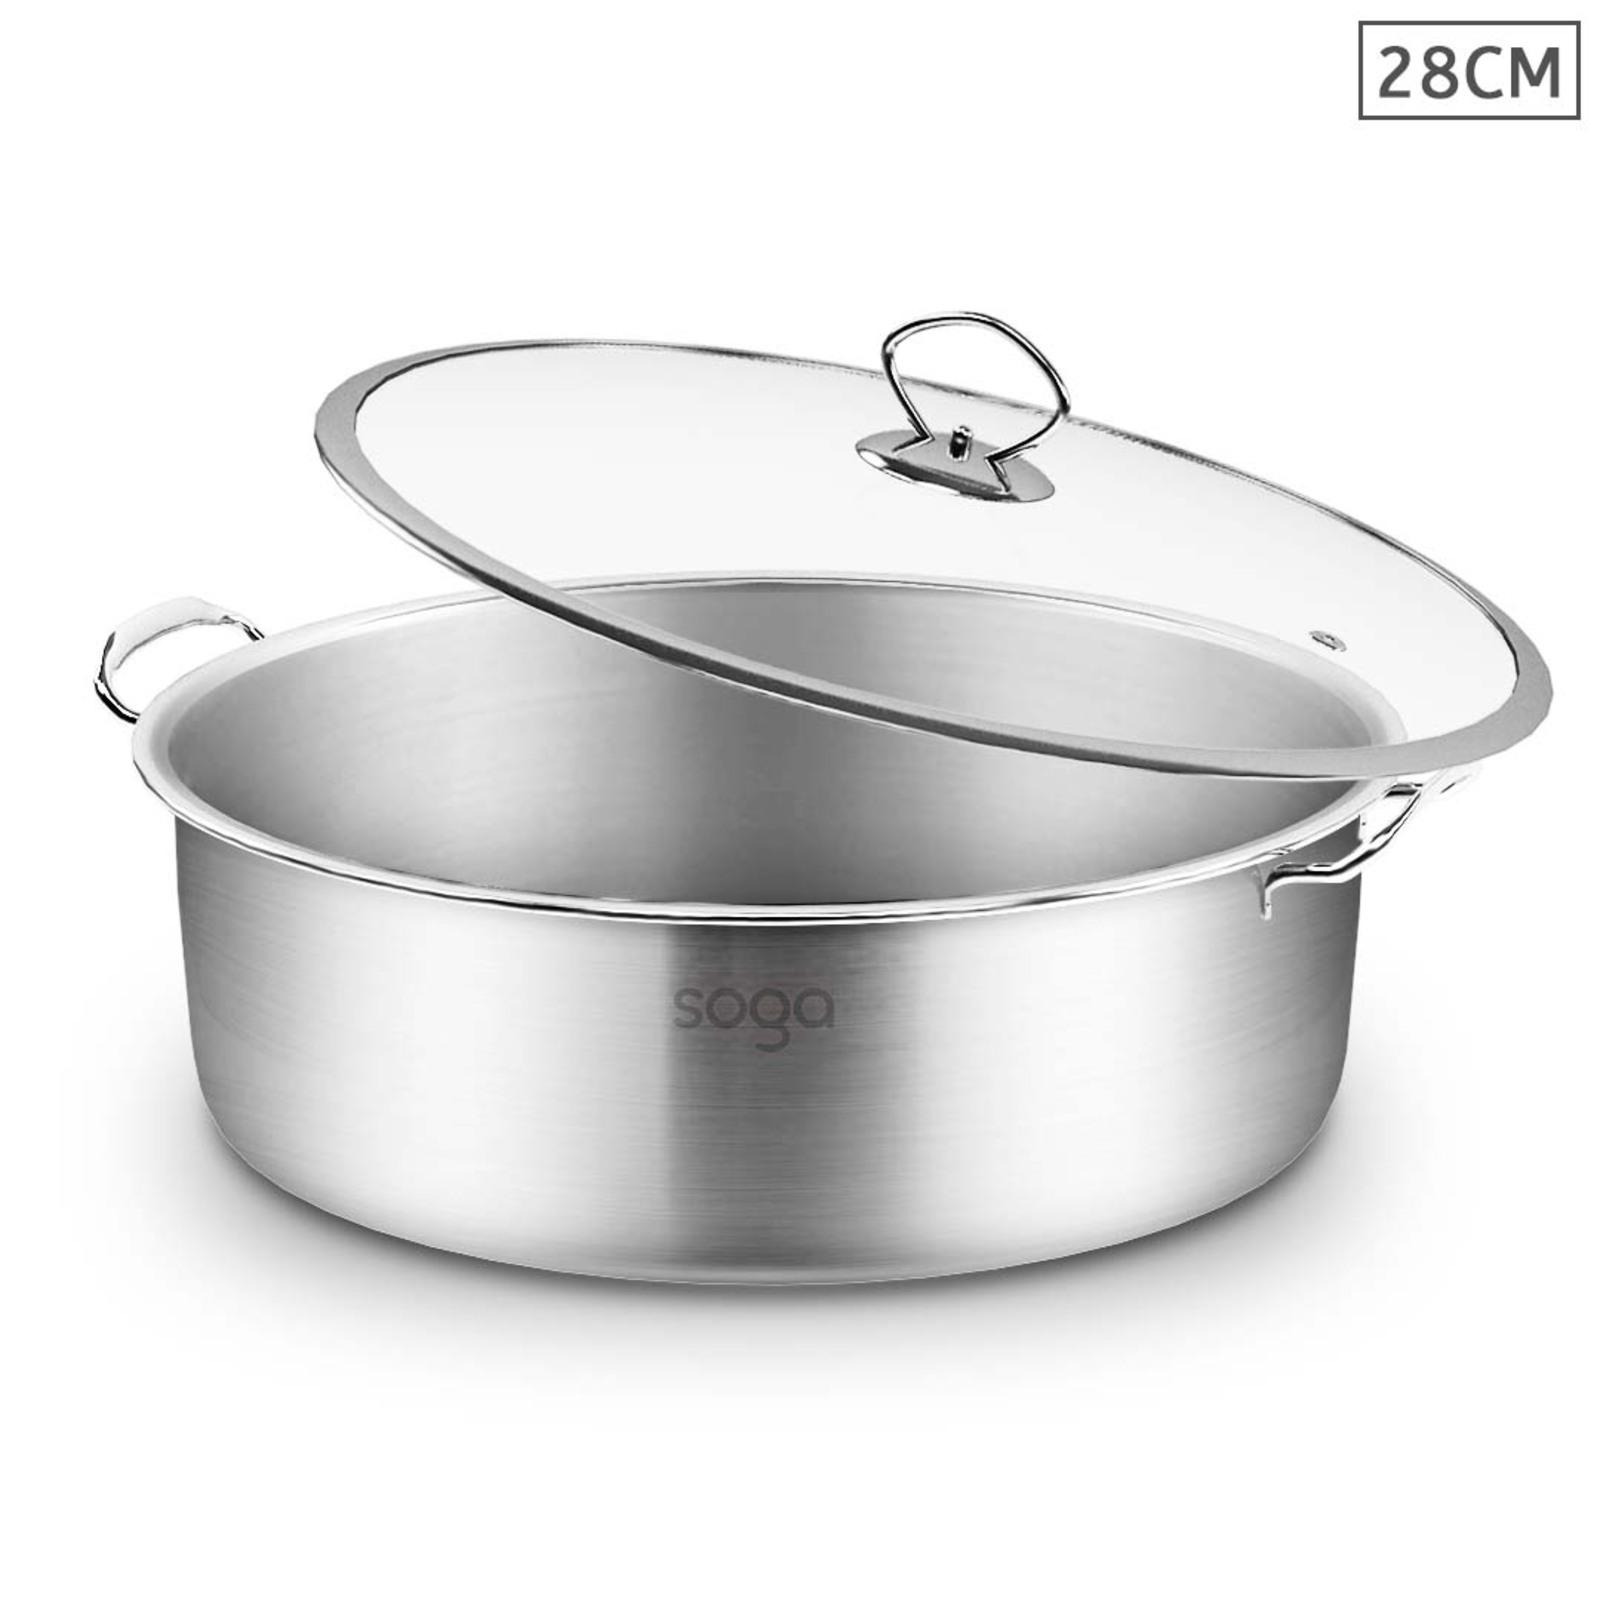 SOGA 28cm Stainless Steel Casserole